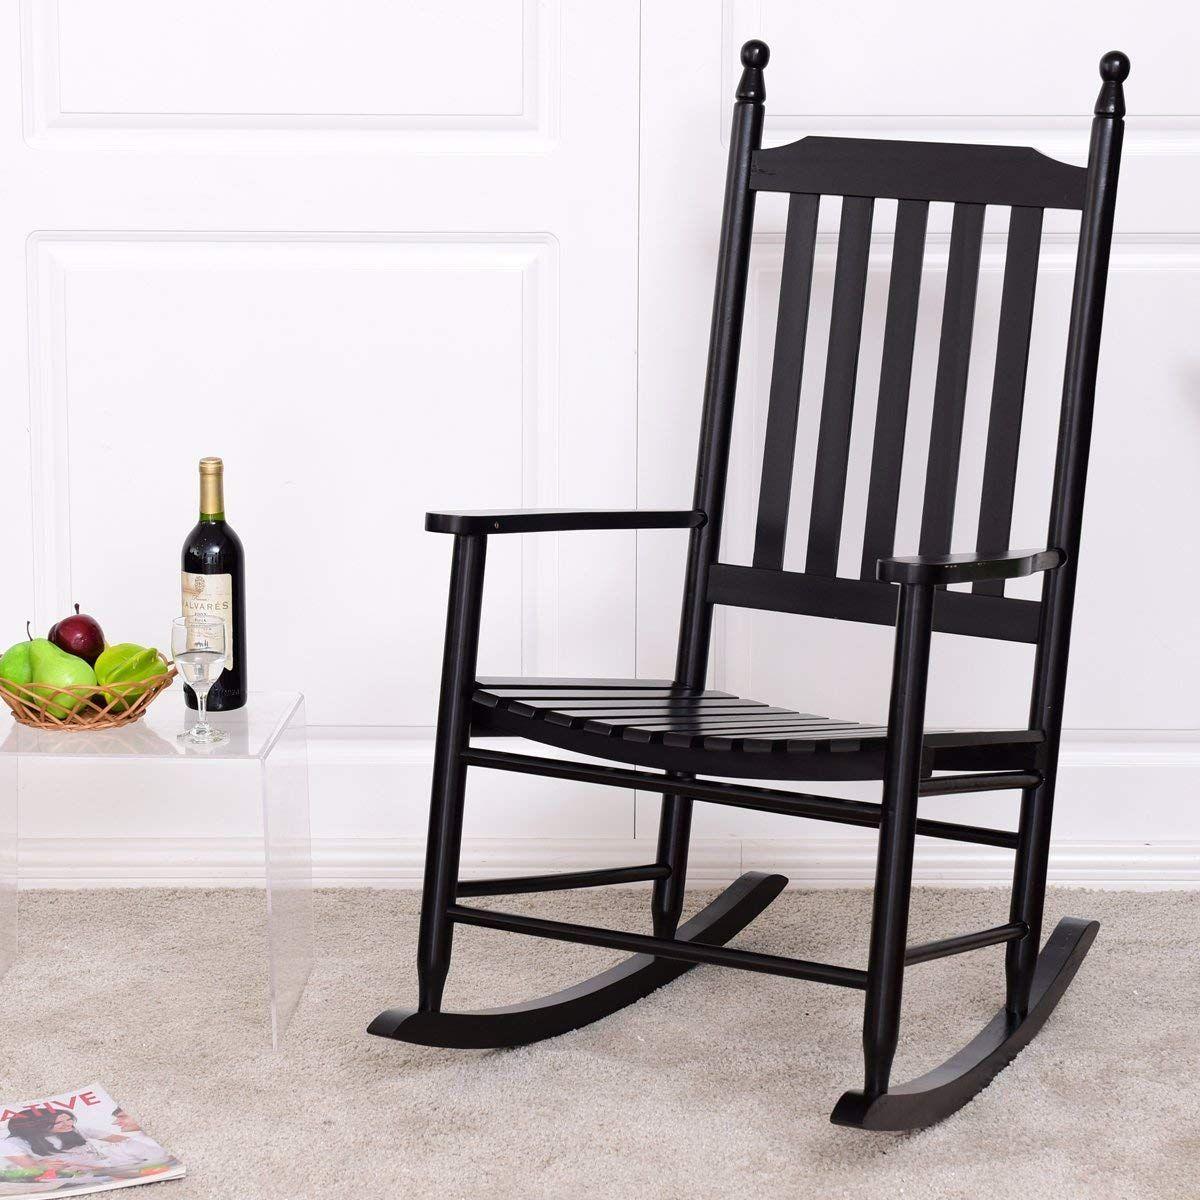 Giantex Wood Outdoor Rocking Chair, Wooden